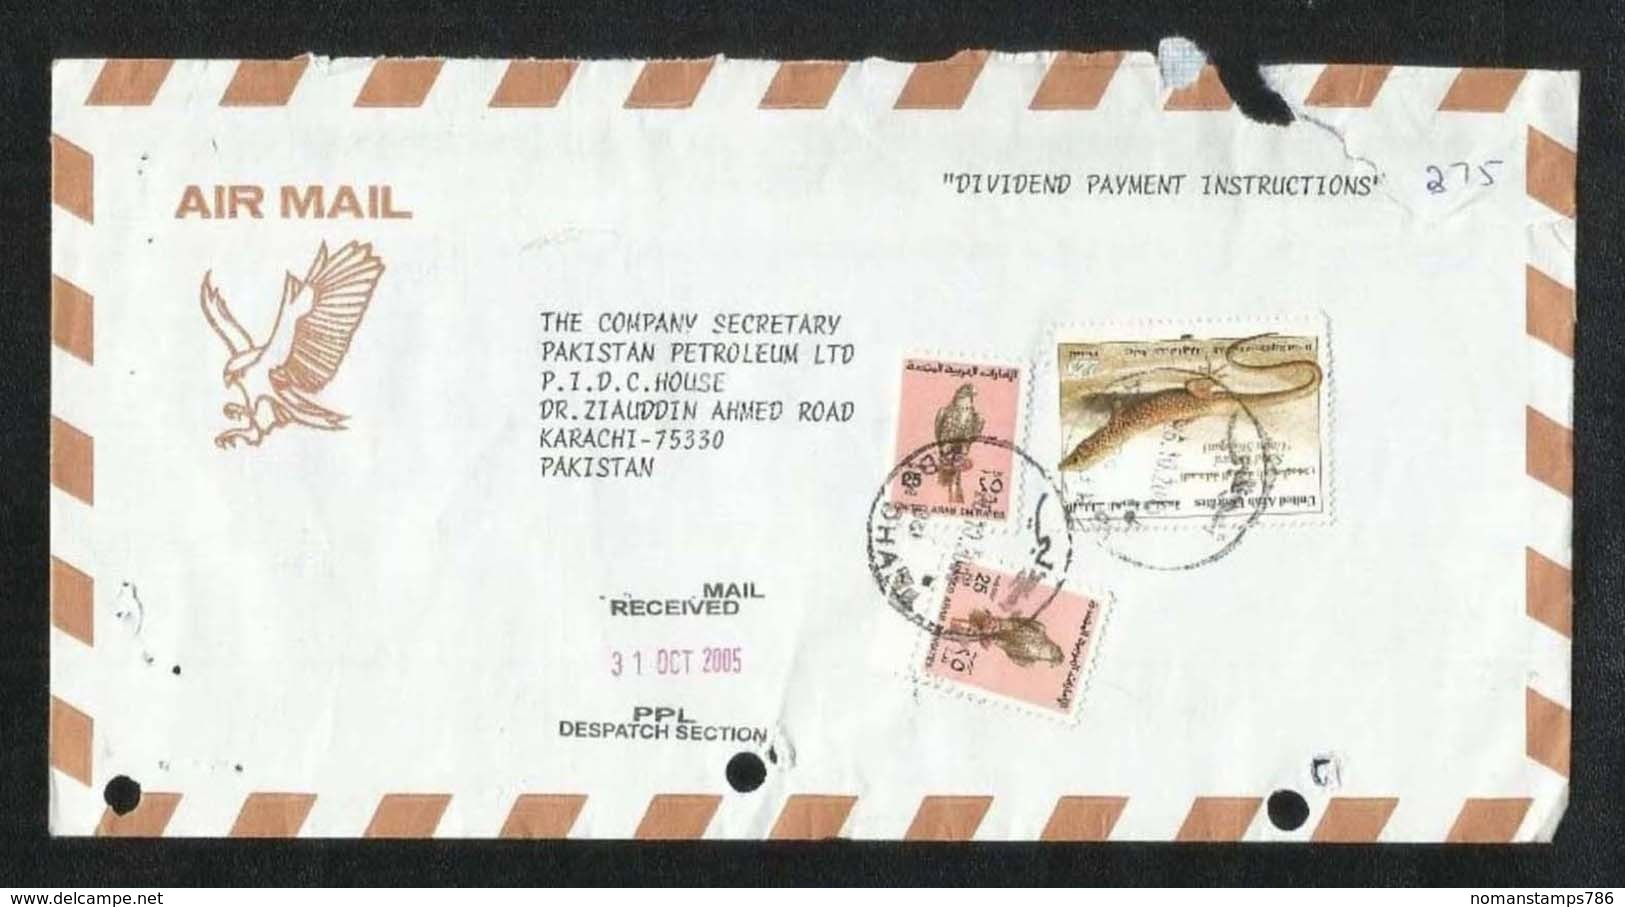 United Arab Emirates UAE Despatch POSTMARK Air Mail Postal Used Cover Abu Dhabi To Pakistan Desert Animal - Abu Dhabi